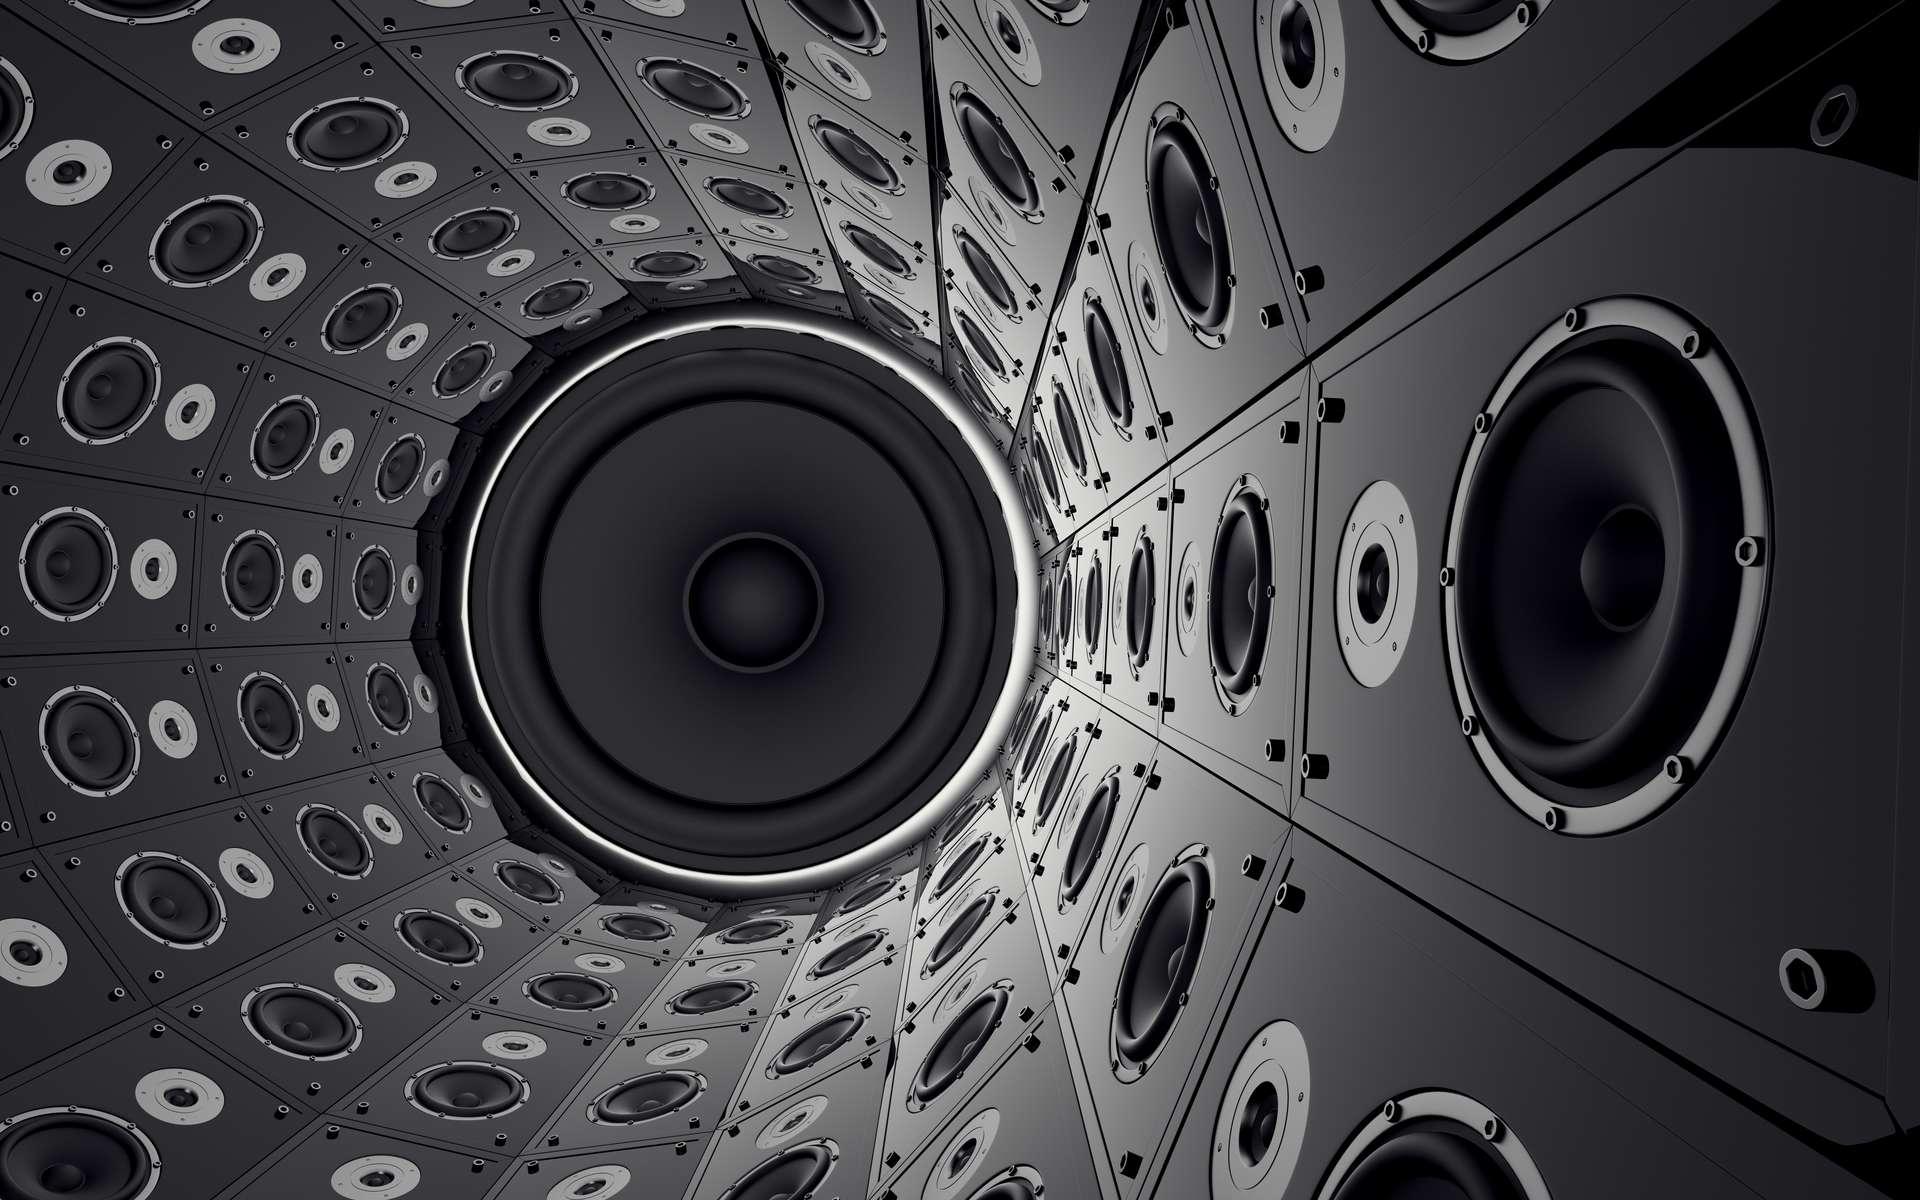 Le son surround offre une expérience auditive. © Dabarti, Adobe Stock